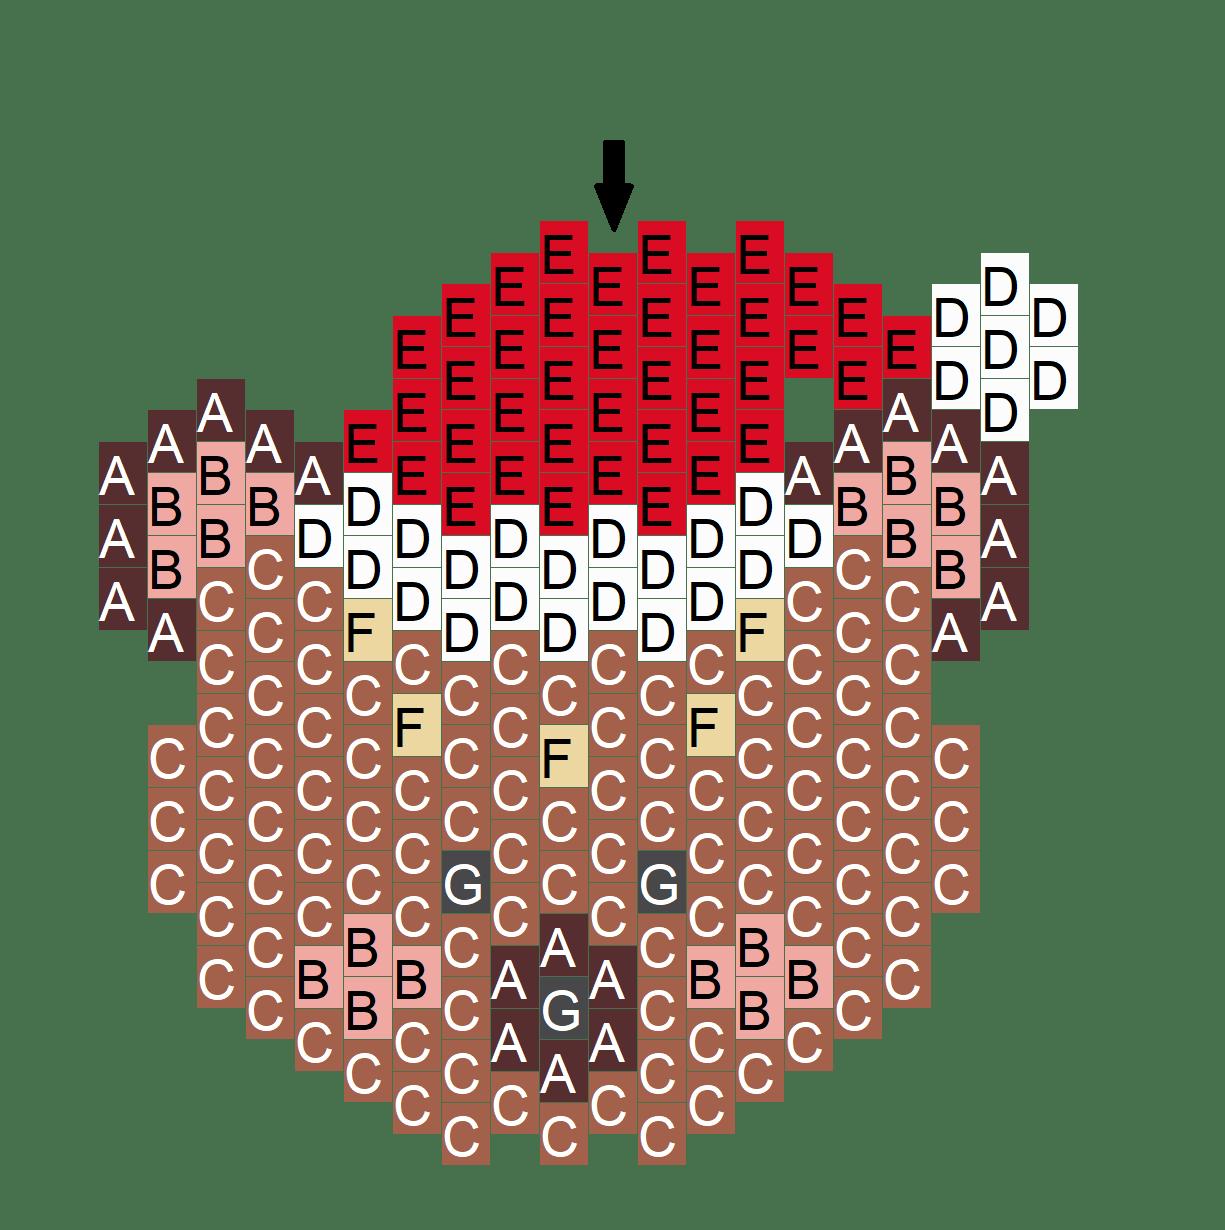 brown bear diagram gas furnace spark ignitor patrón p re s nº puntada de tejido ladrillo